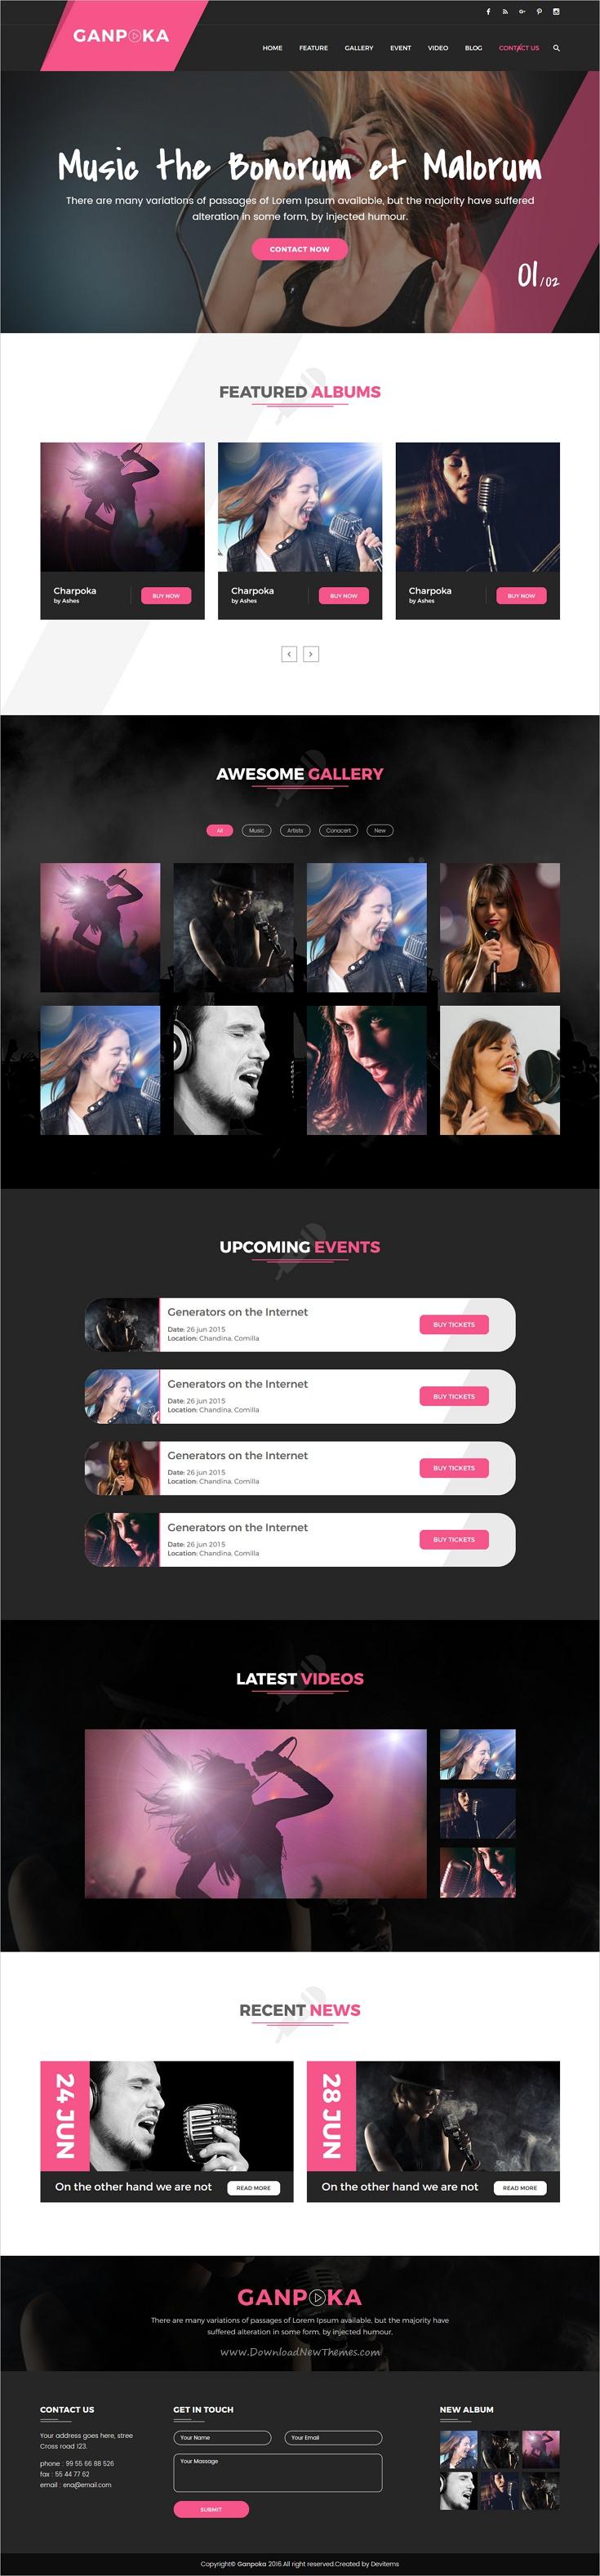 Ganpoka - Singer Celebrity HTML Template | Template, Web design ...